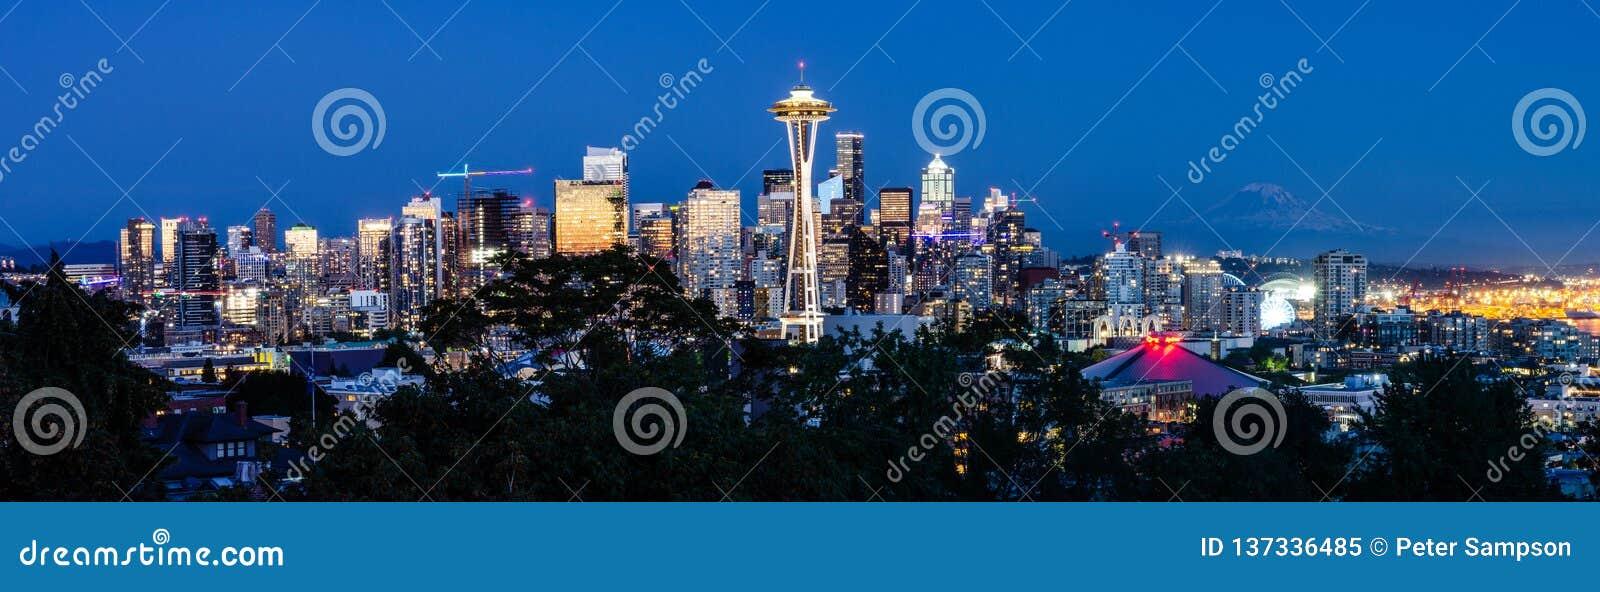 Skyline de Seattle na noite